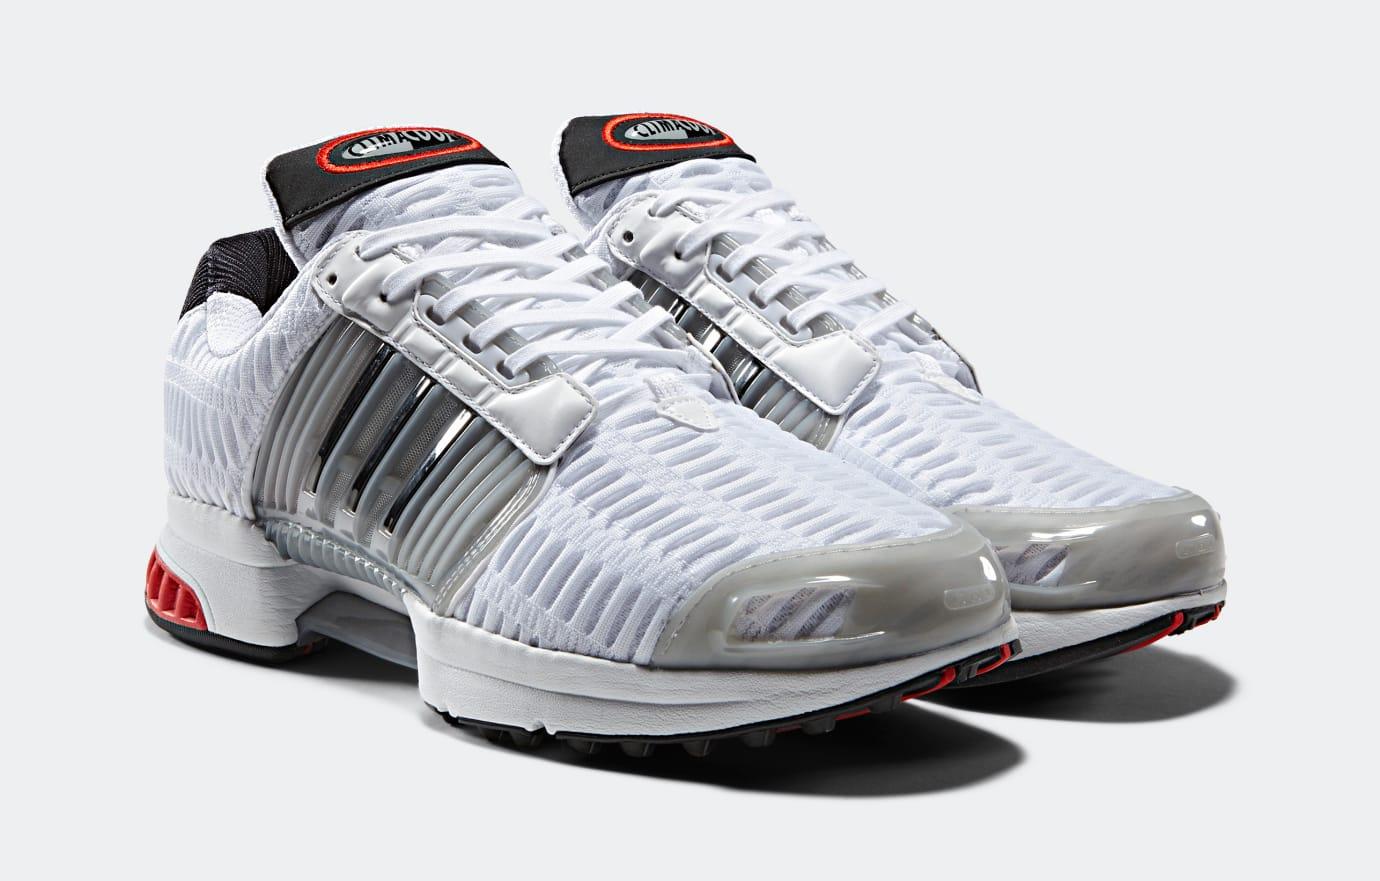 Adidas Climacool OG 1